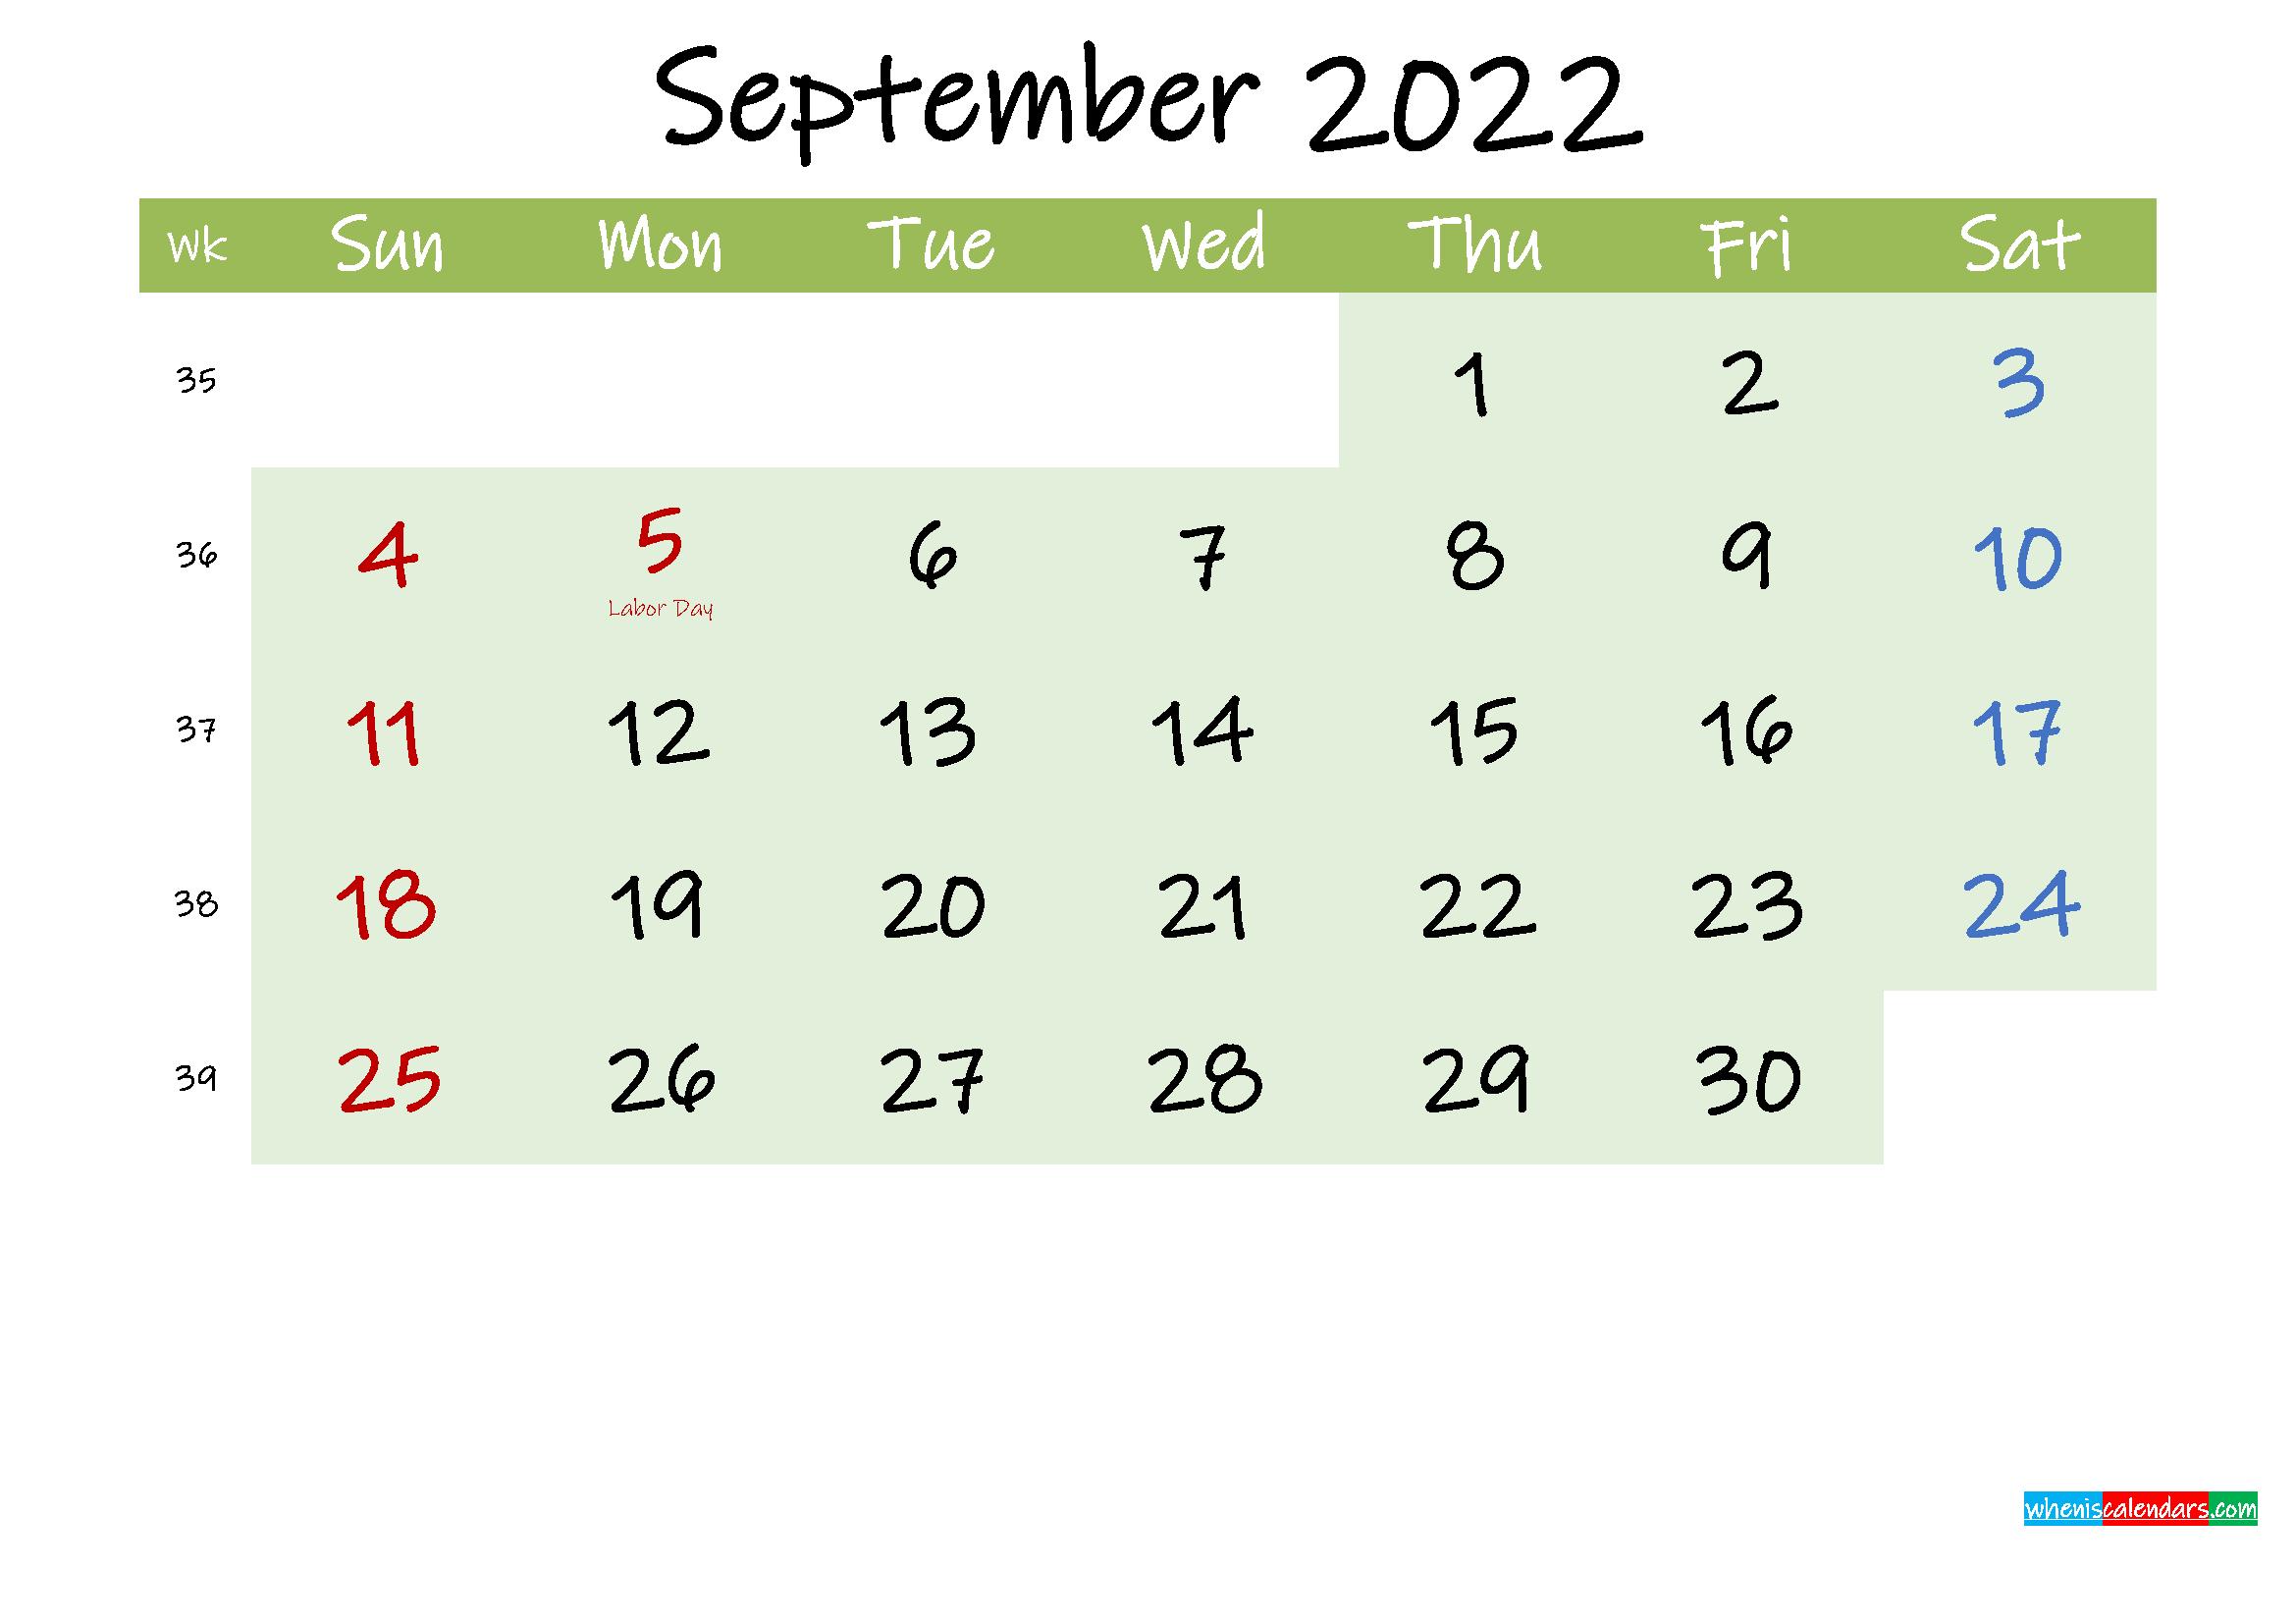 September 2022 Calendar with Holidays Printable